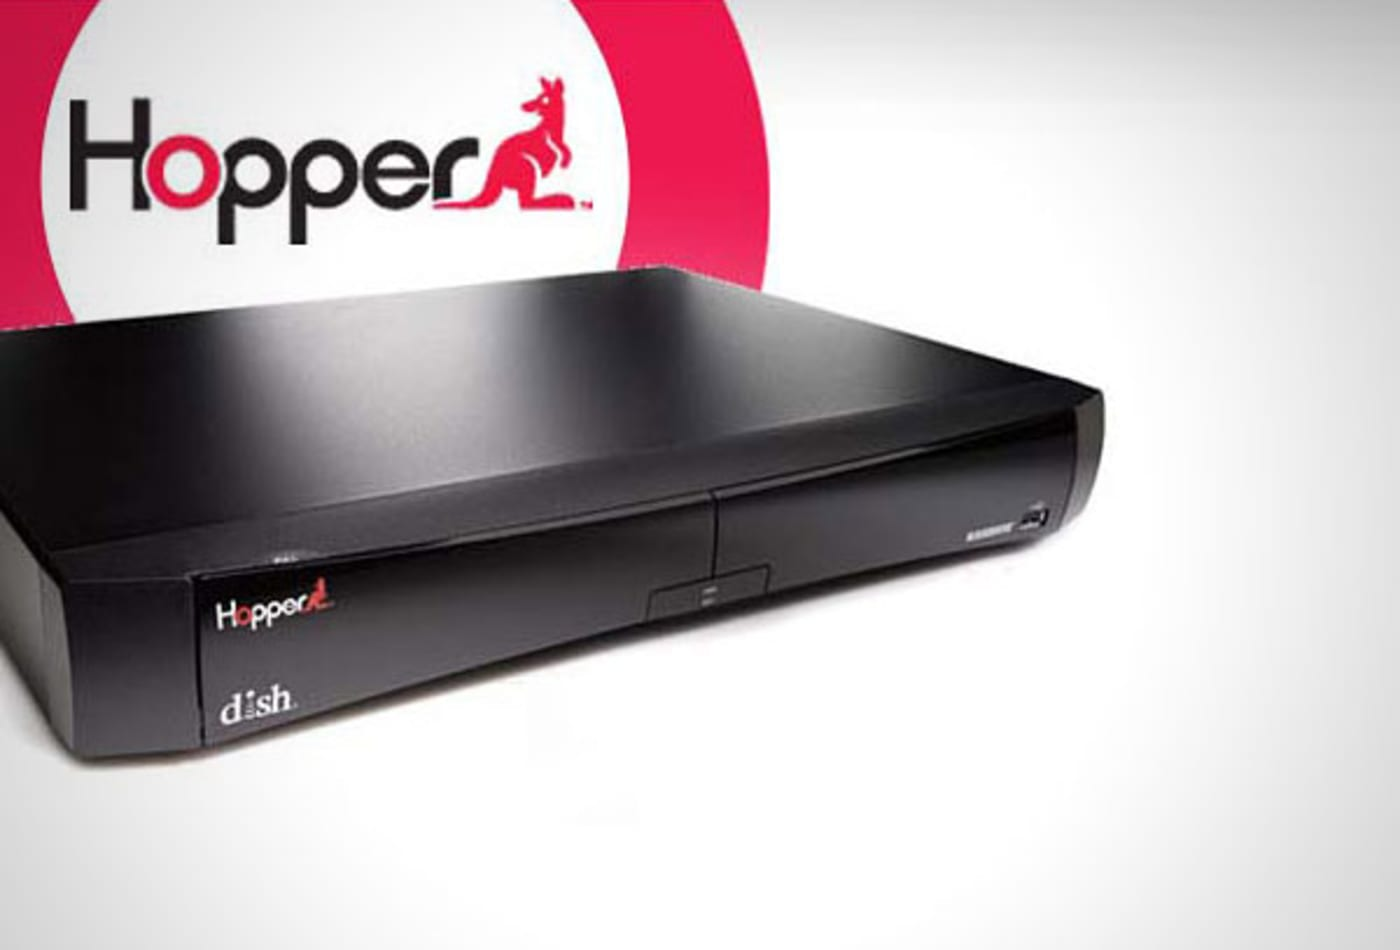 CES-most-interesting-gadgets-hopper.jpg